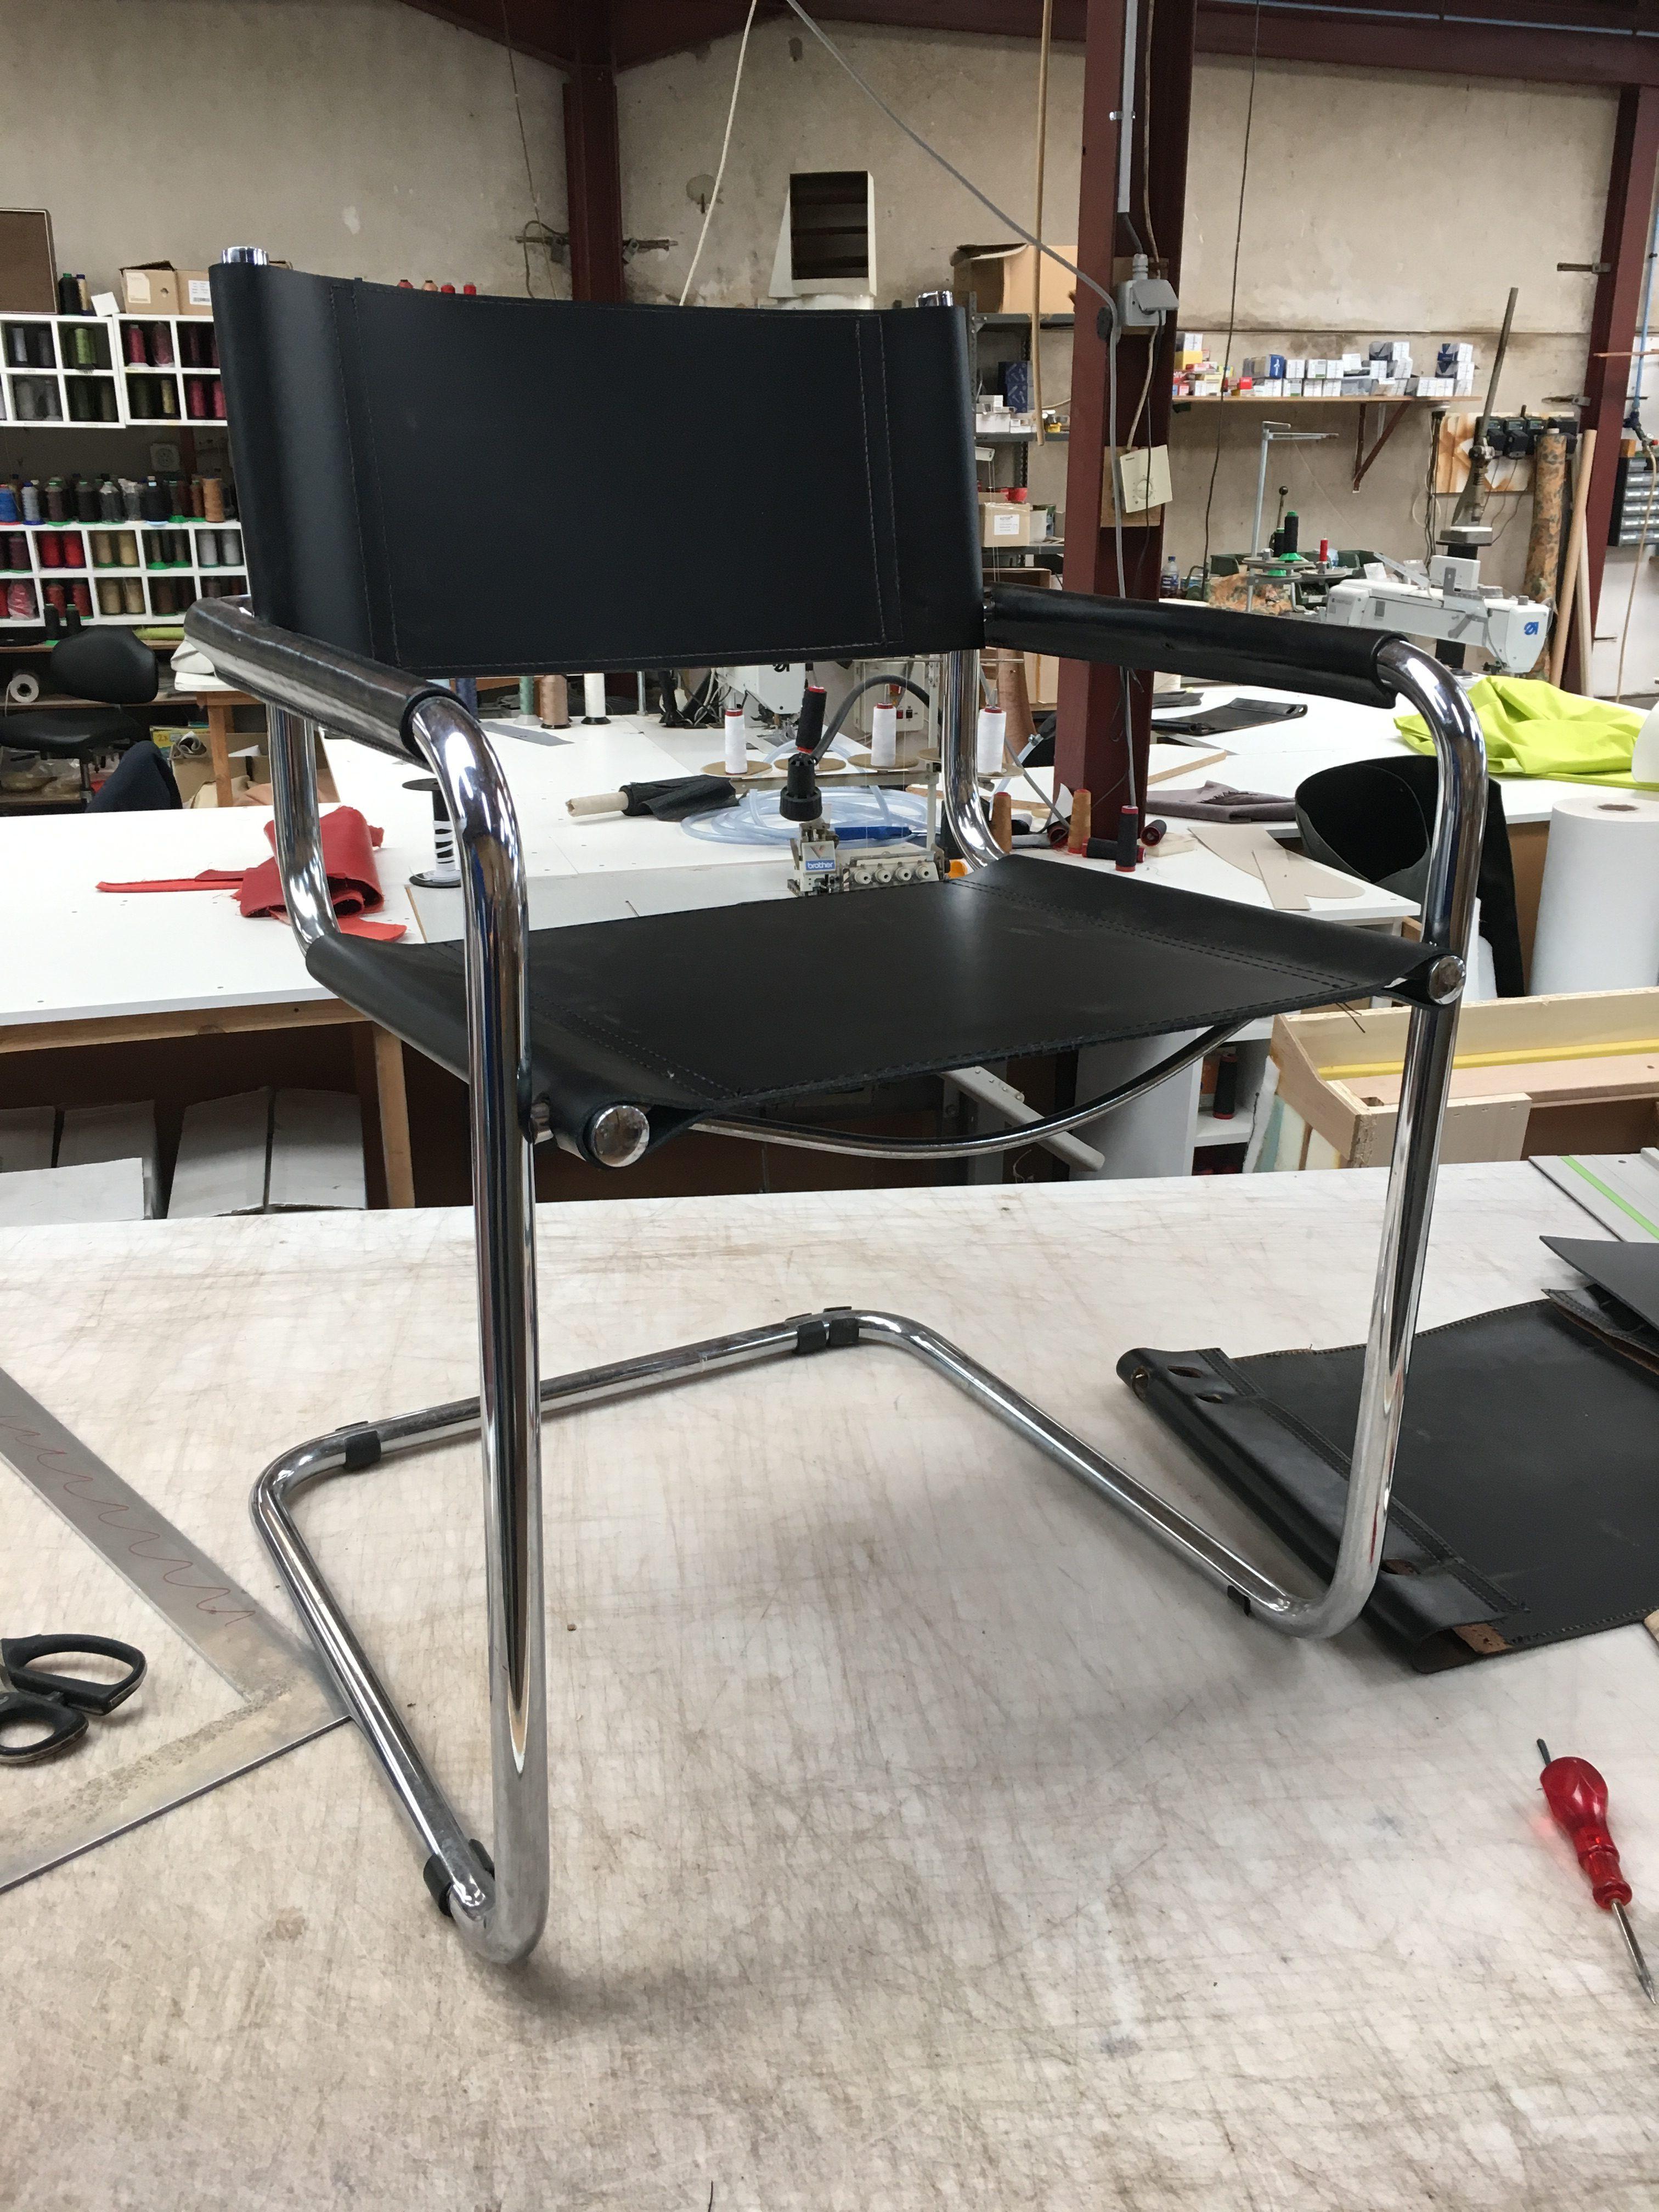 herstelling mart stam s34 stoel van thonet de stoffeerder. Black Bedroom Furniture Sets. Home Design Ideas